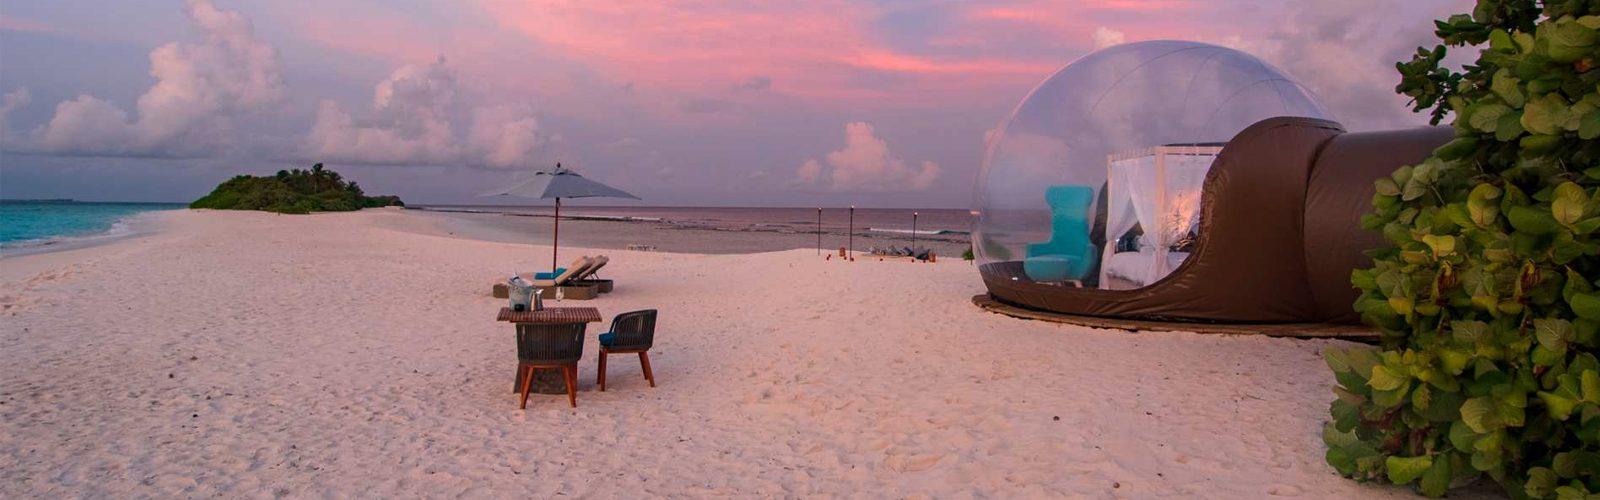 Sri Lanka And Maldives Multi Centre Holiday Package Header